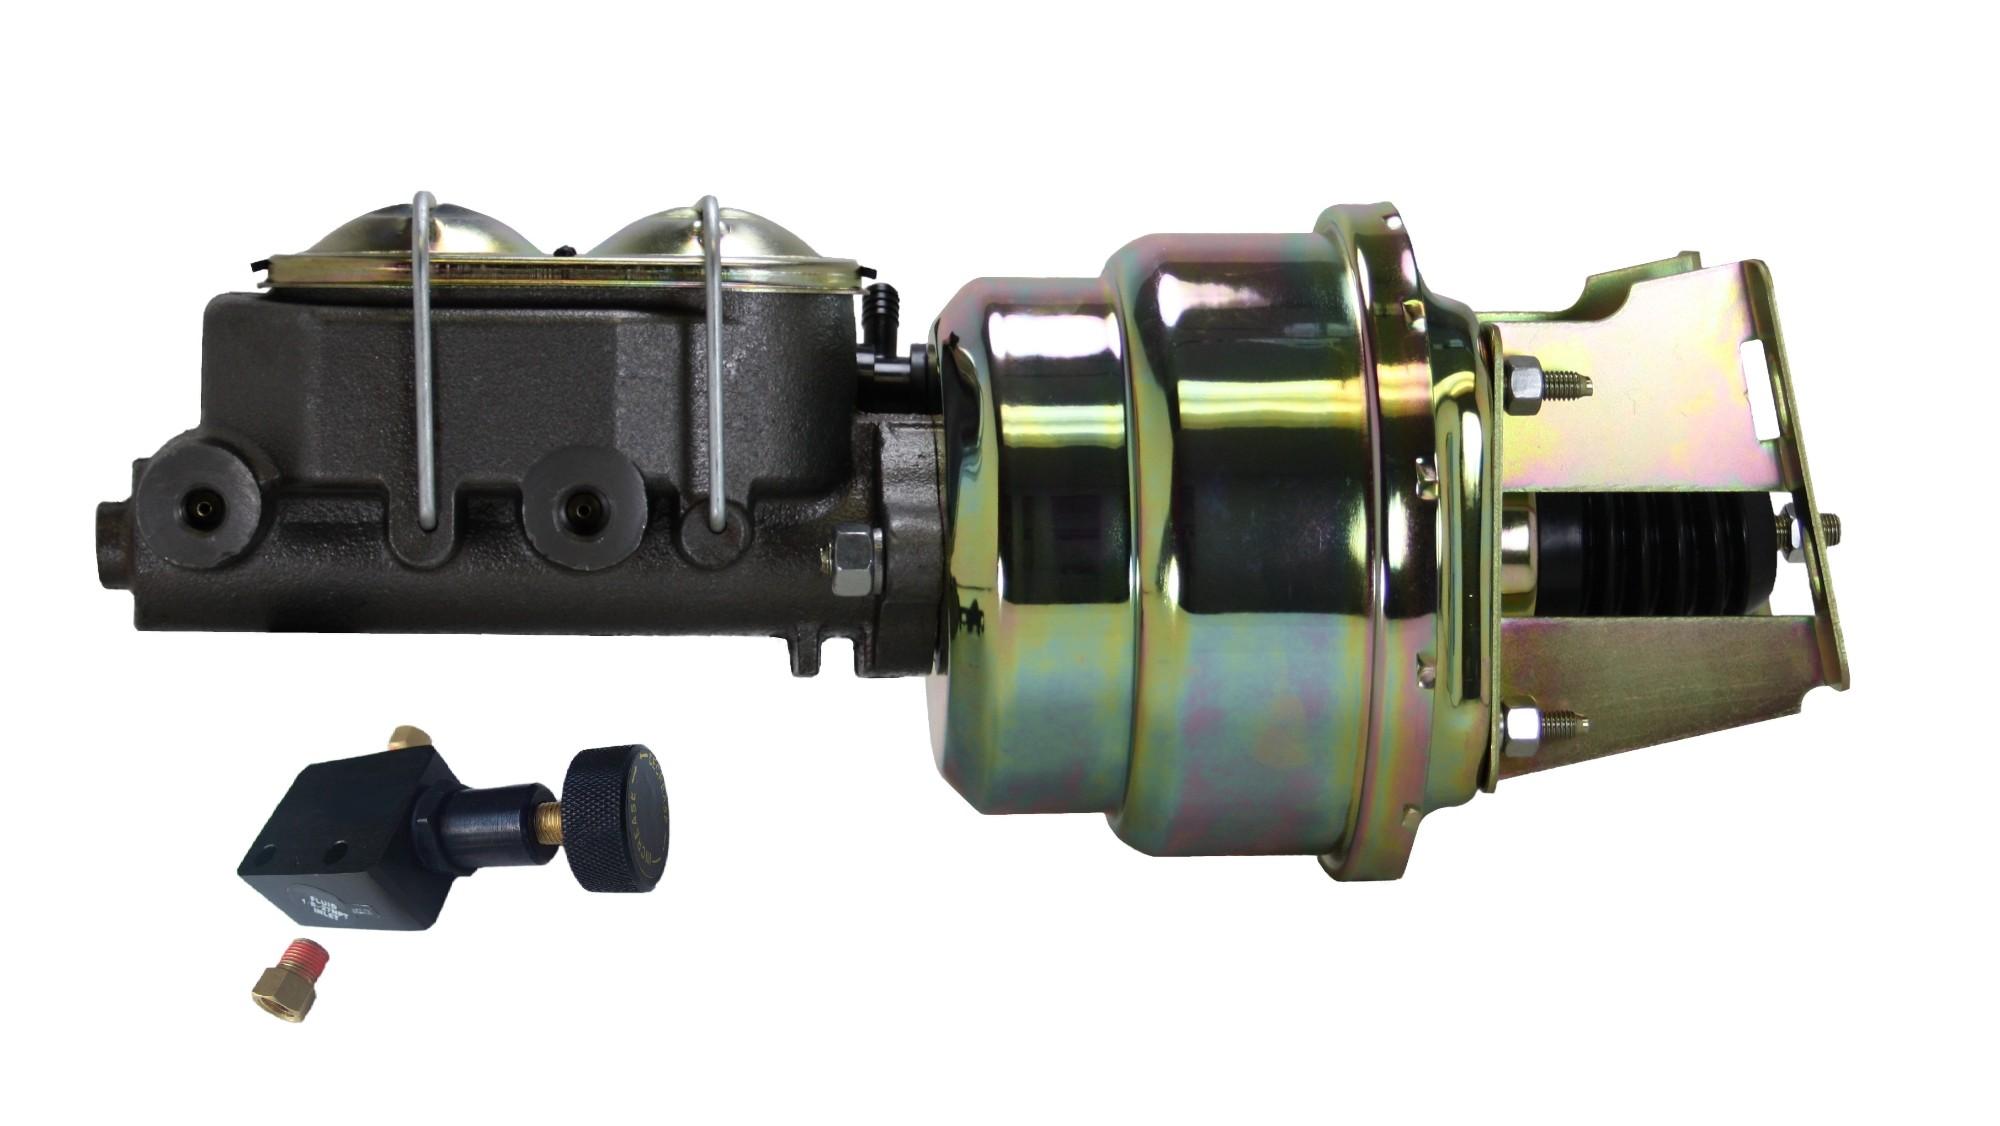 LEED Brakes 3K105 7 in Dual Power Booster ,1-1/8in Bore, Adj Prop Valve (Zinc)